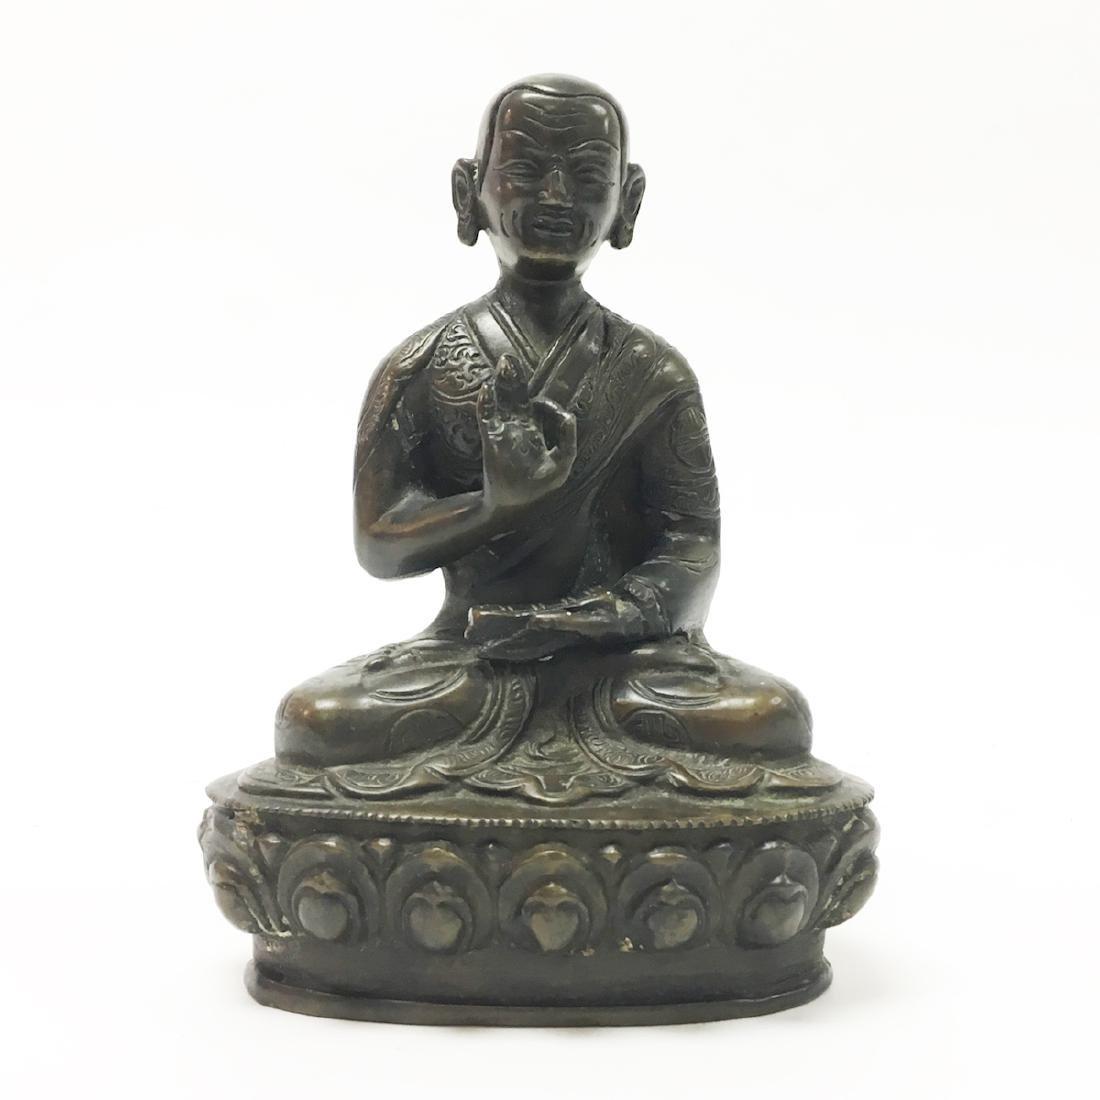 Chinese Bronze Lama Qing Dynasty Figure